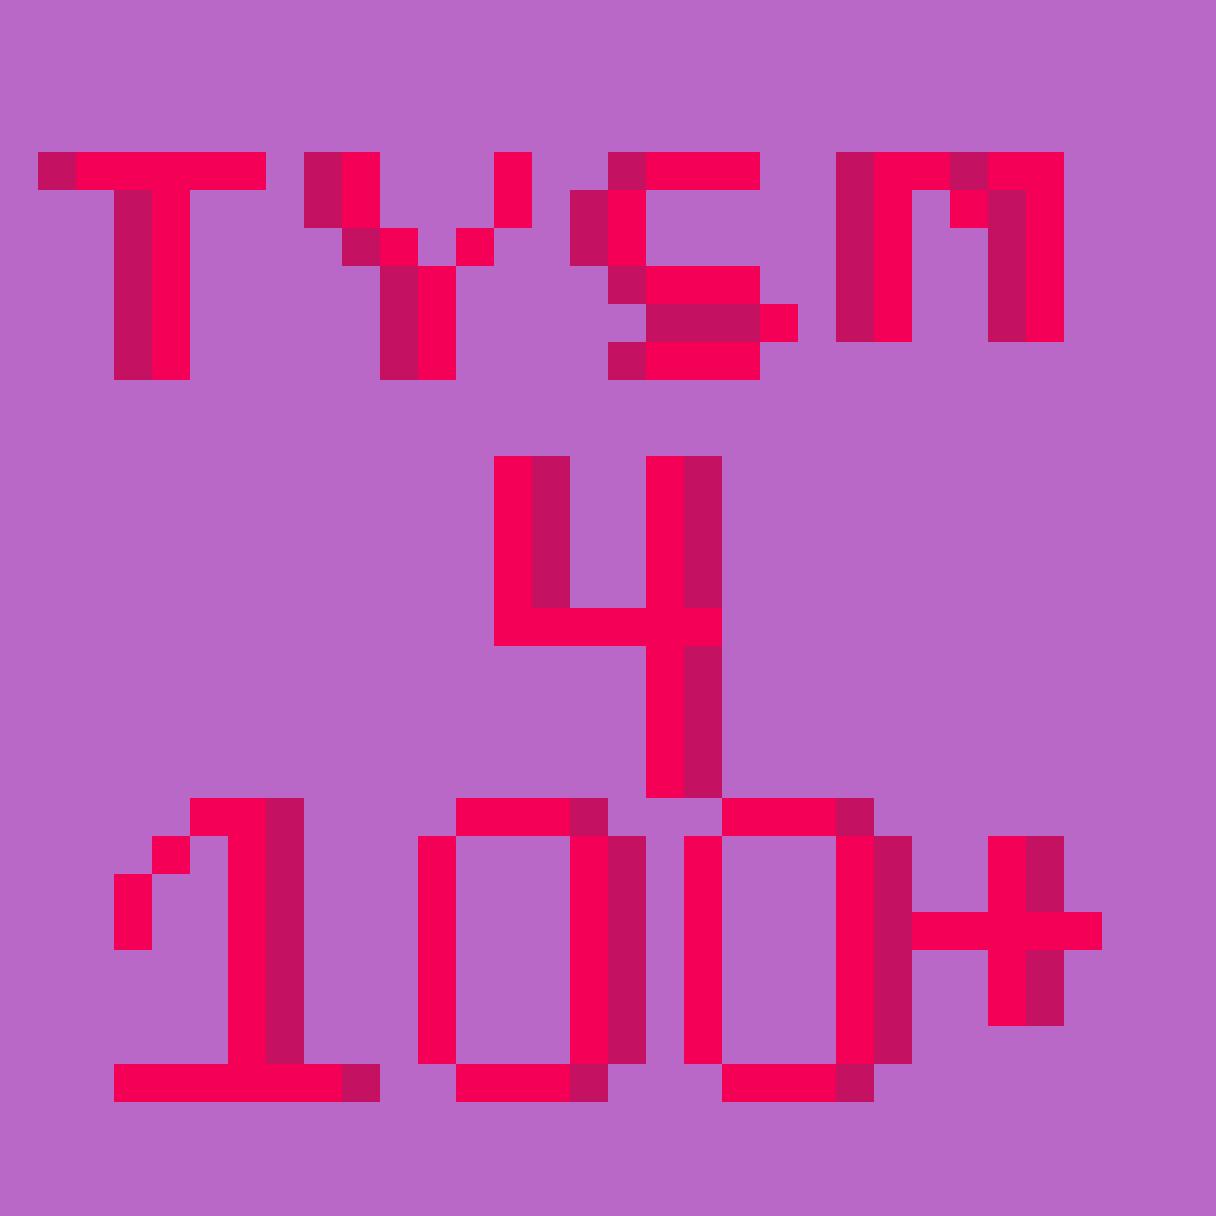 TYSM FOR 100